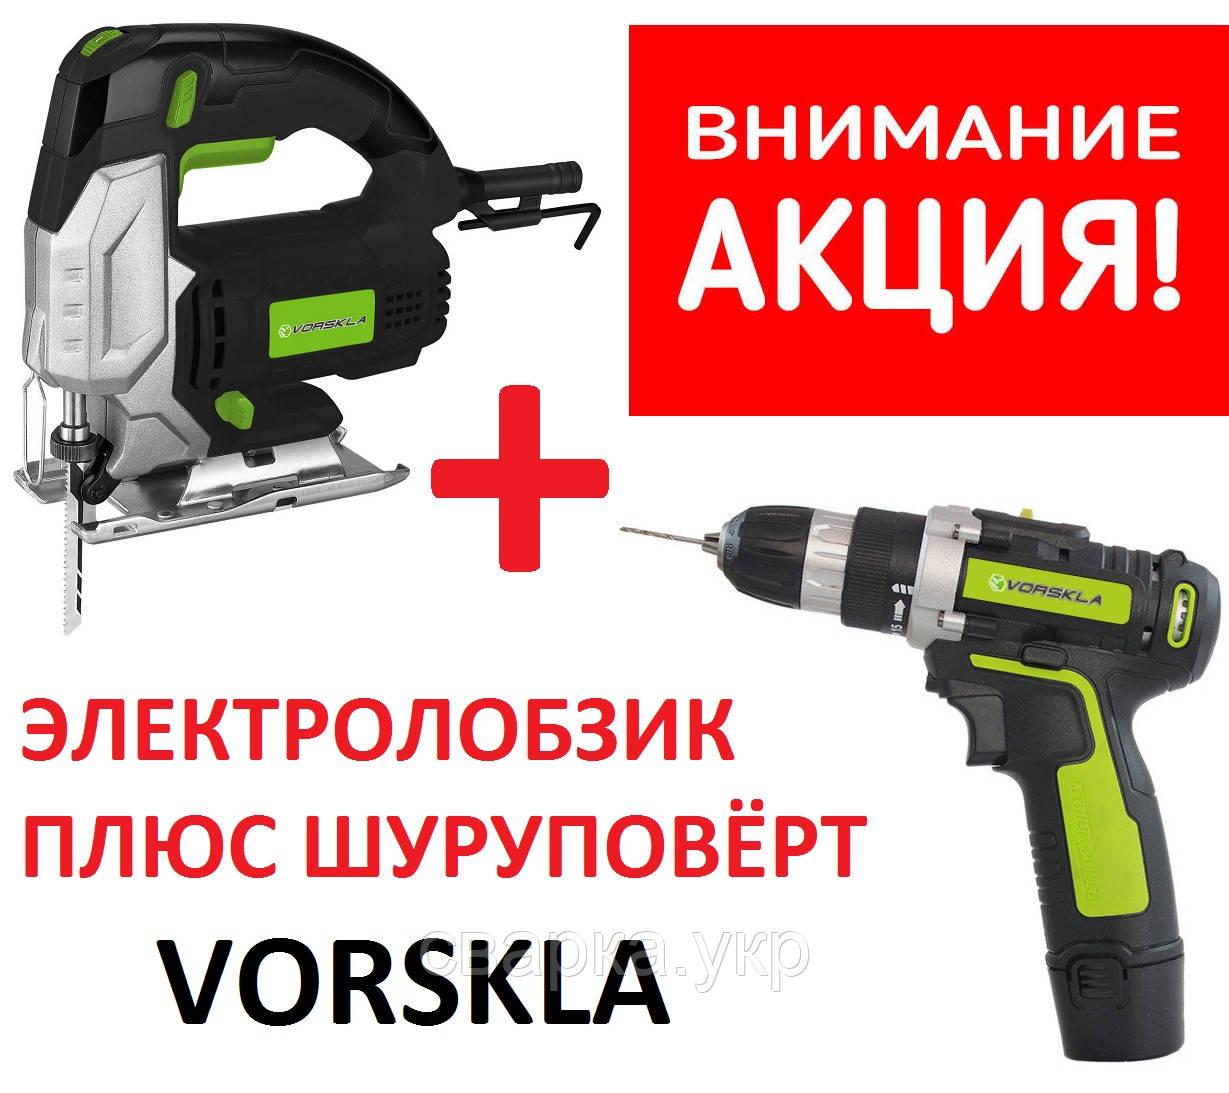 АКЦІЯ!!! Шуруповерт акумуляторний + Електролобзик VORSKLA